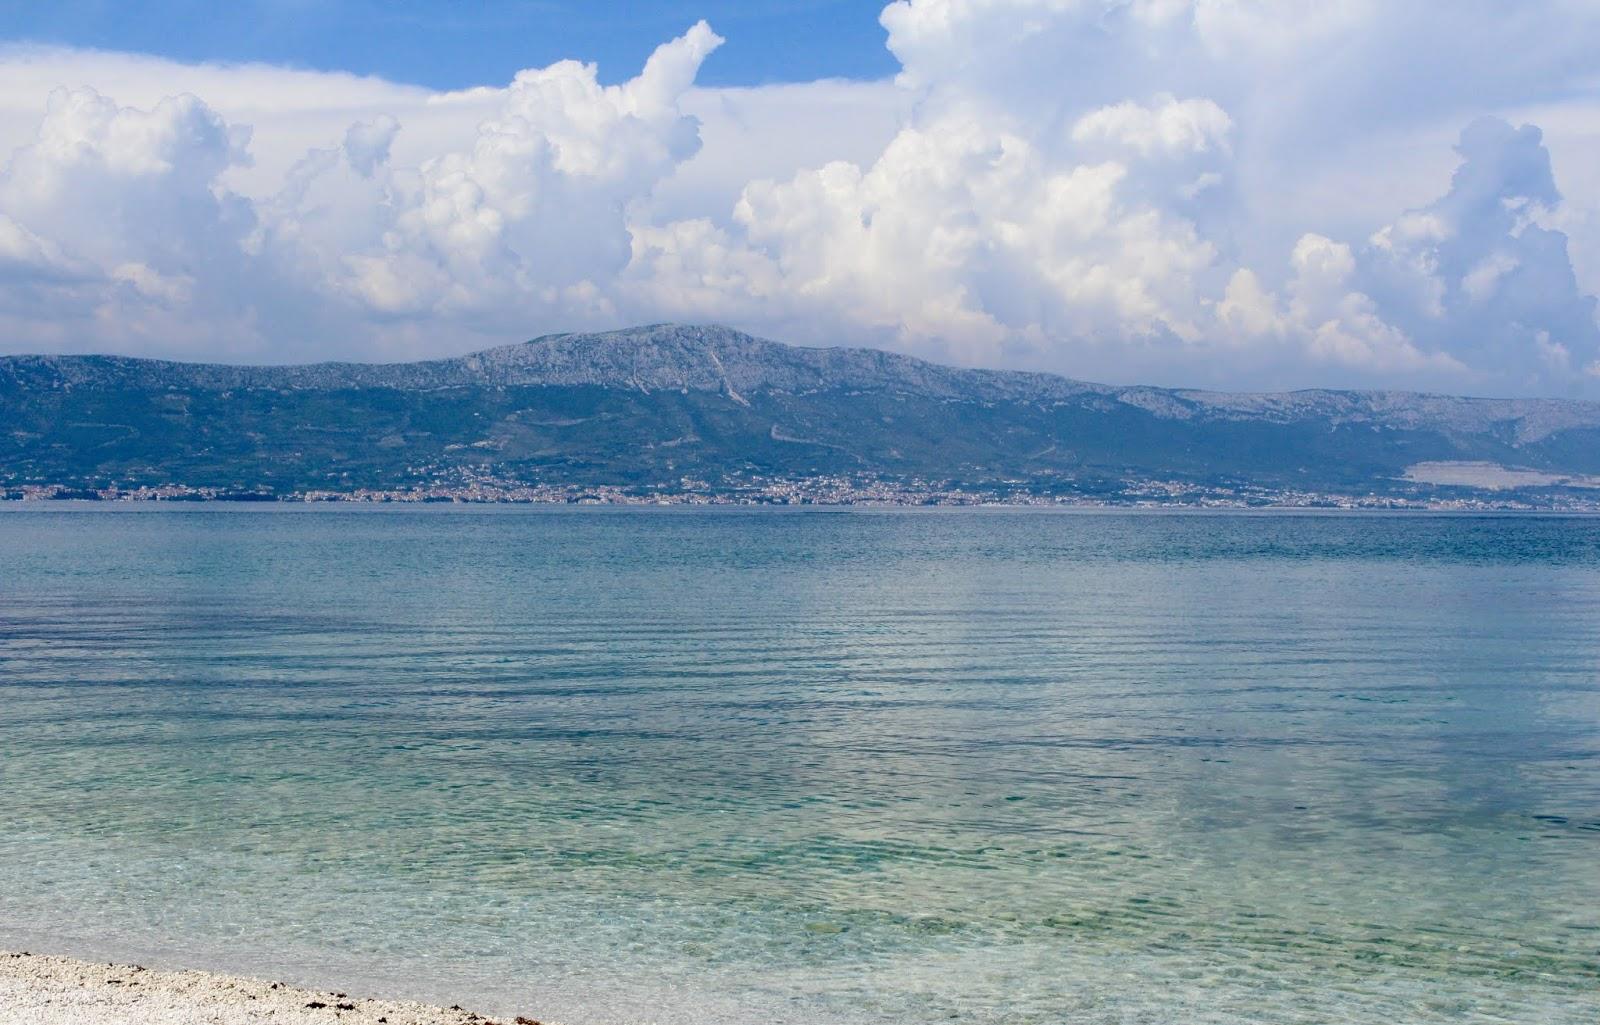 Kristallklares adriatisches Meer vor der Insel Ciovo, Kroatien